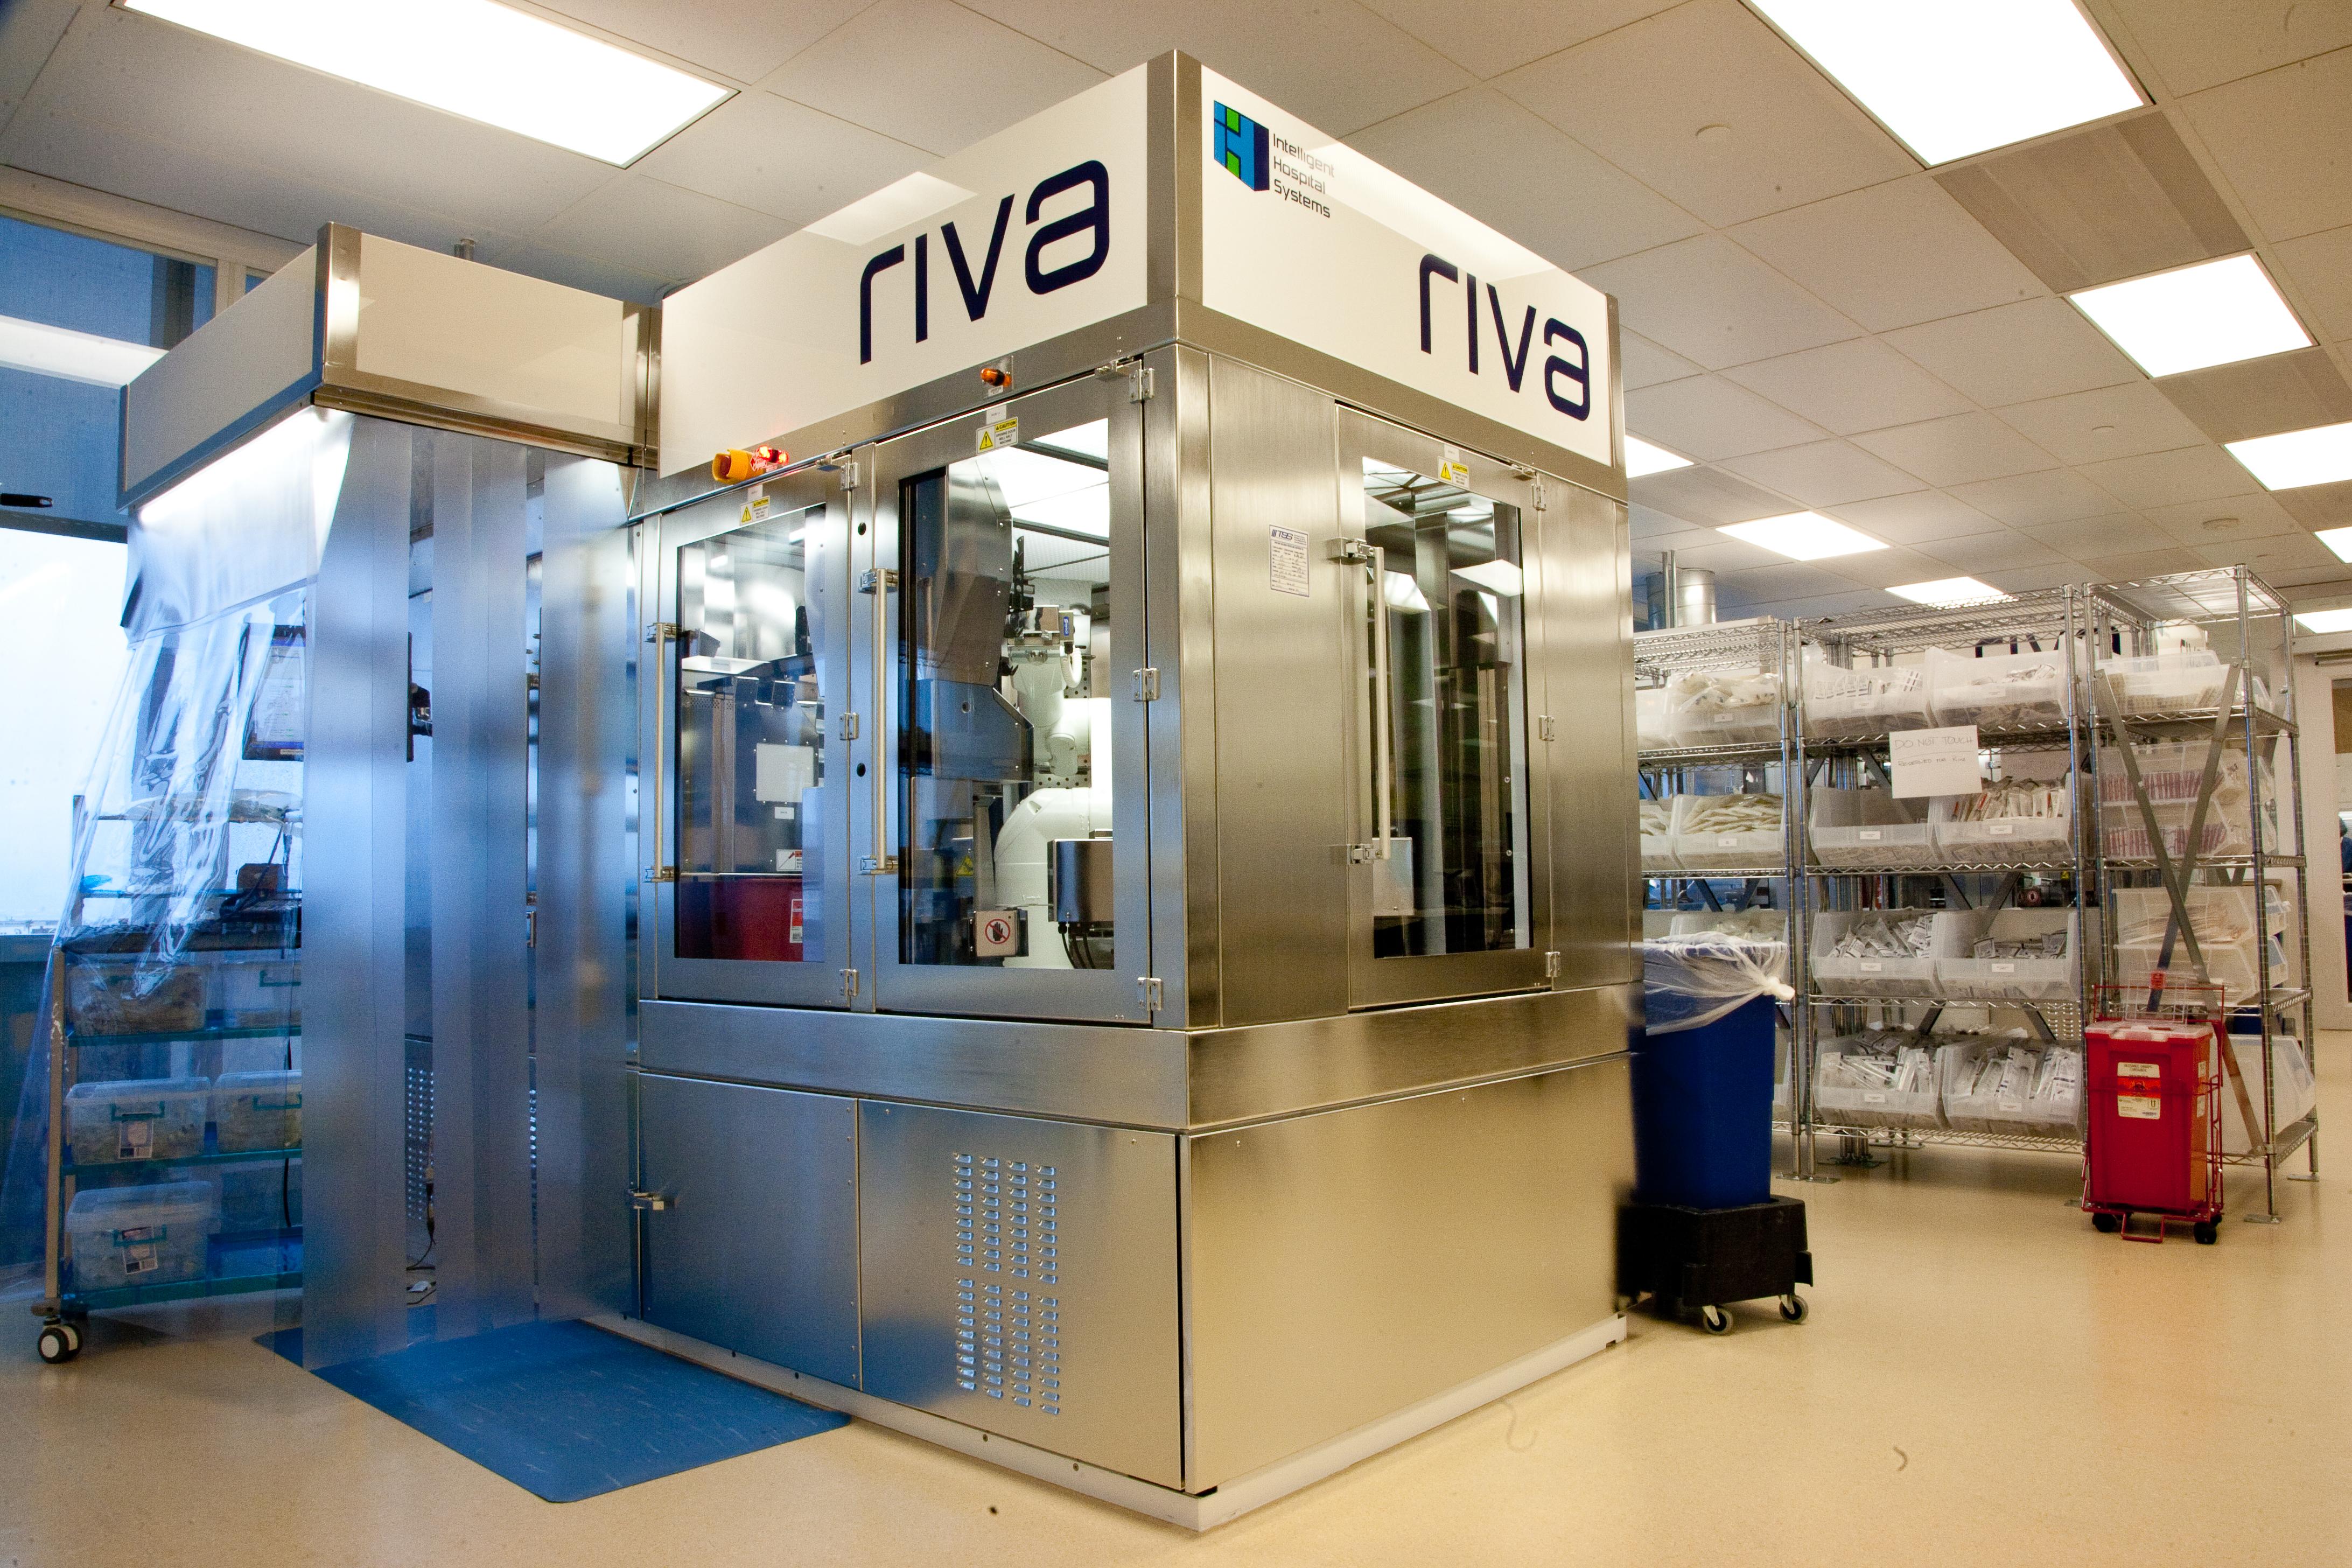 Press Kit Robotic Pharmacy Images And B Roll Uc San